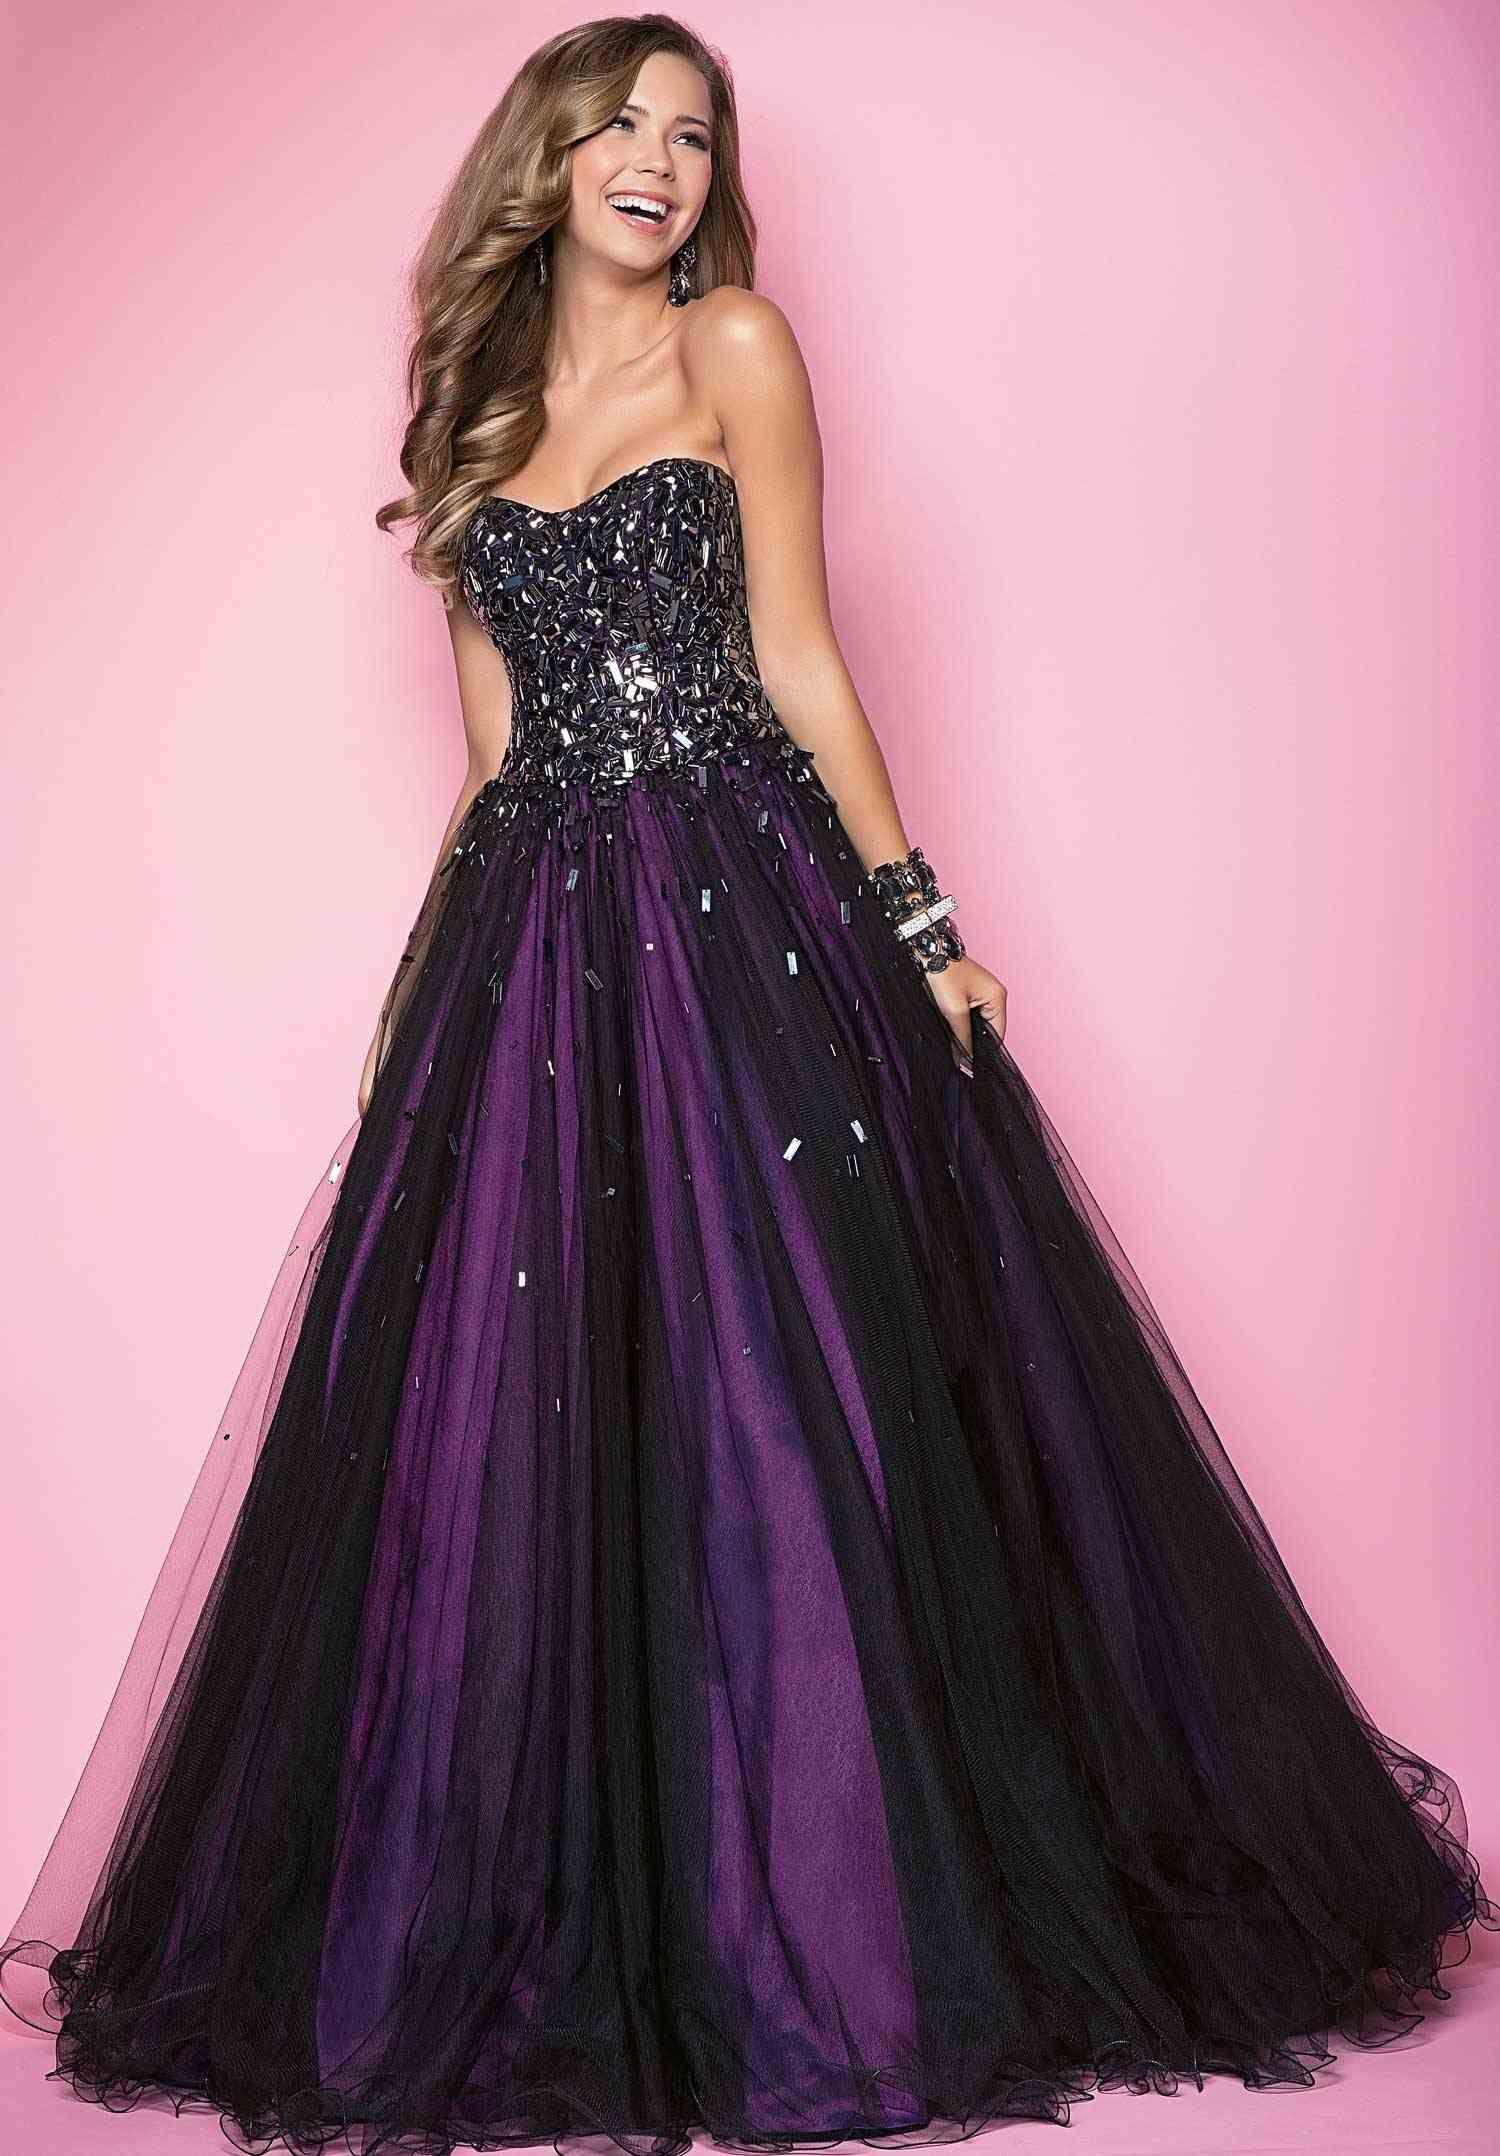 Blush dress dresses pinterest black wedding dresses